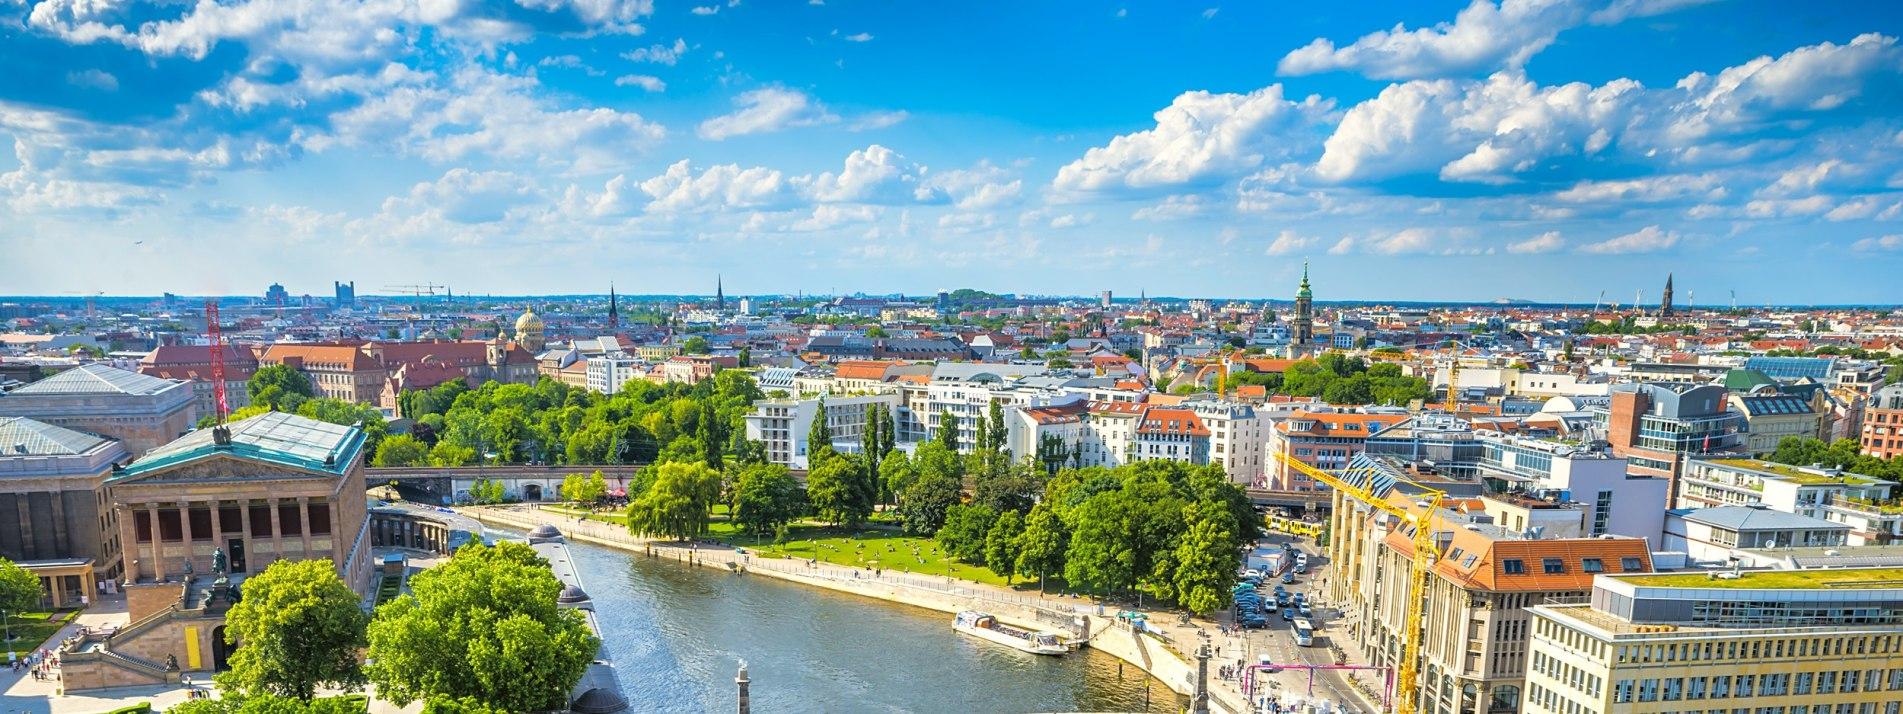 Panoramablick auf Potsdam - BAHNHIT.DE, © getty, Foto: Seqoya